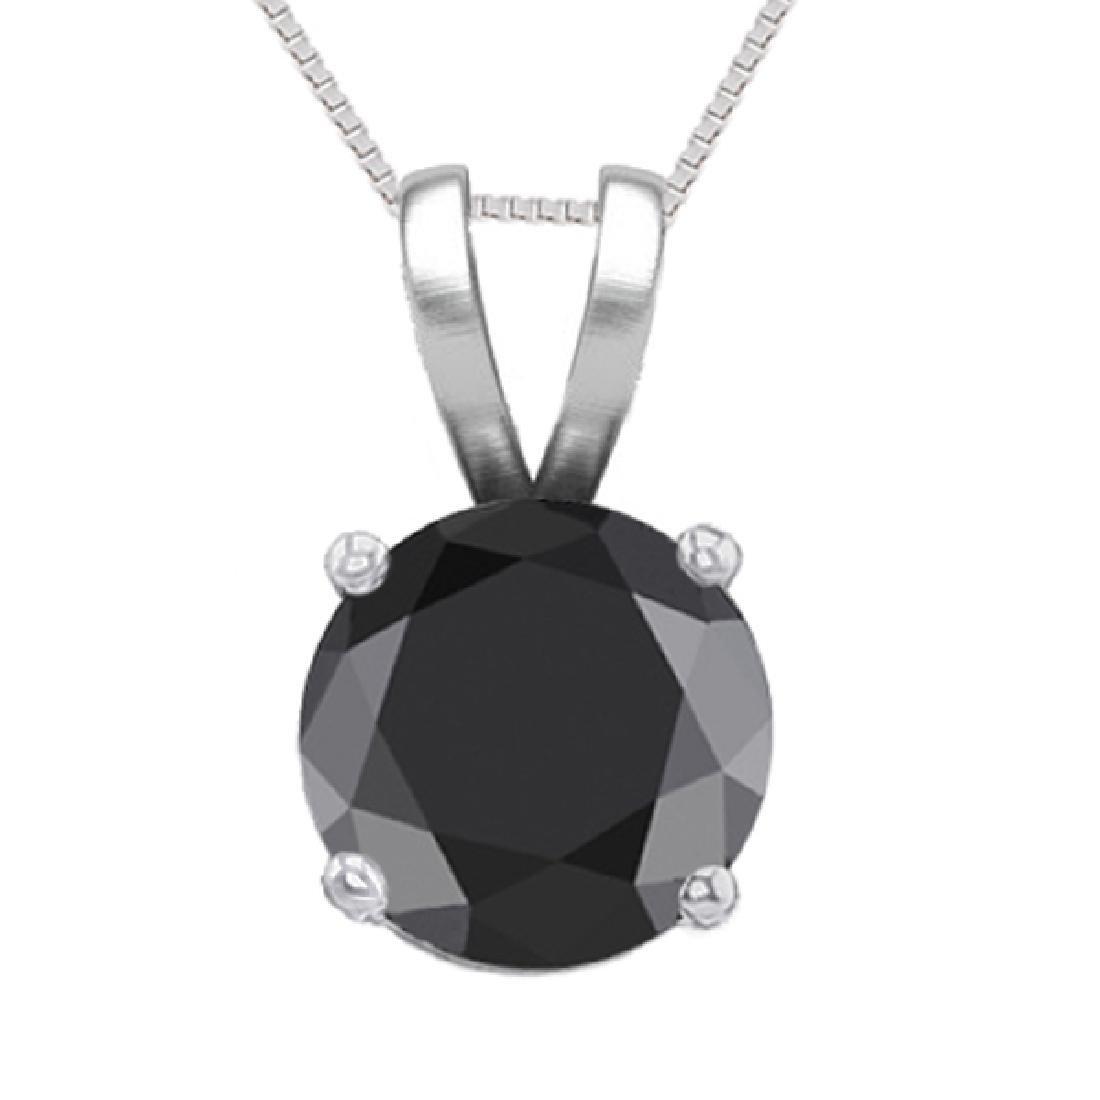 14K White Gold Jewelry 1.02 ct Black Diamond Solitaire